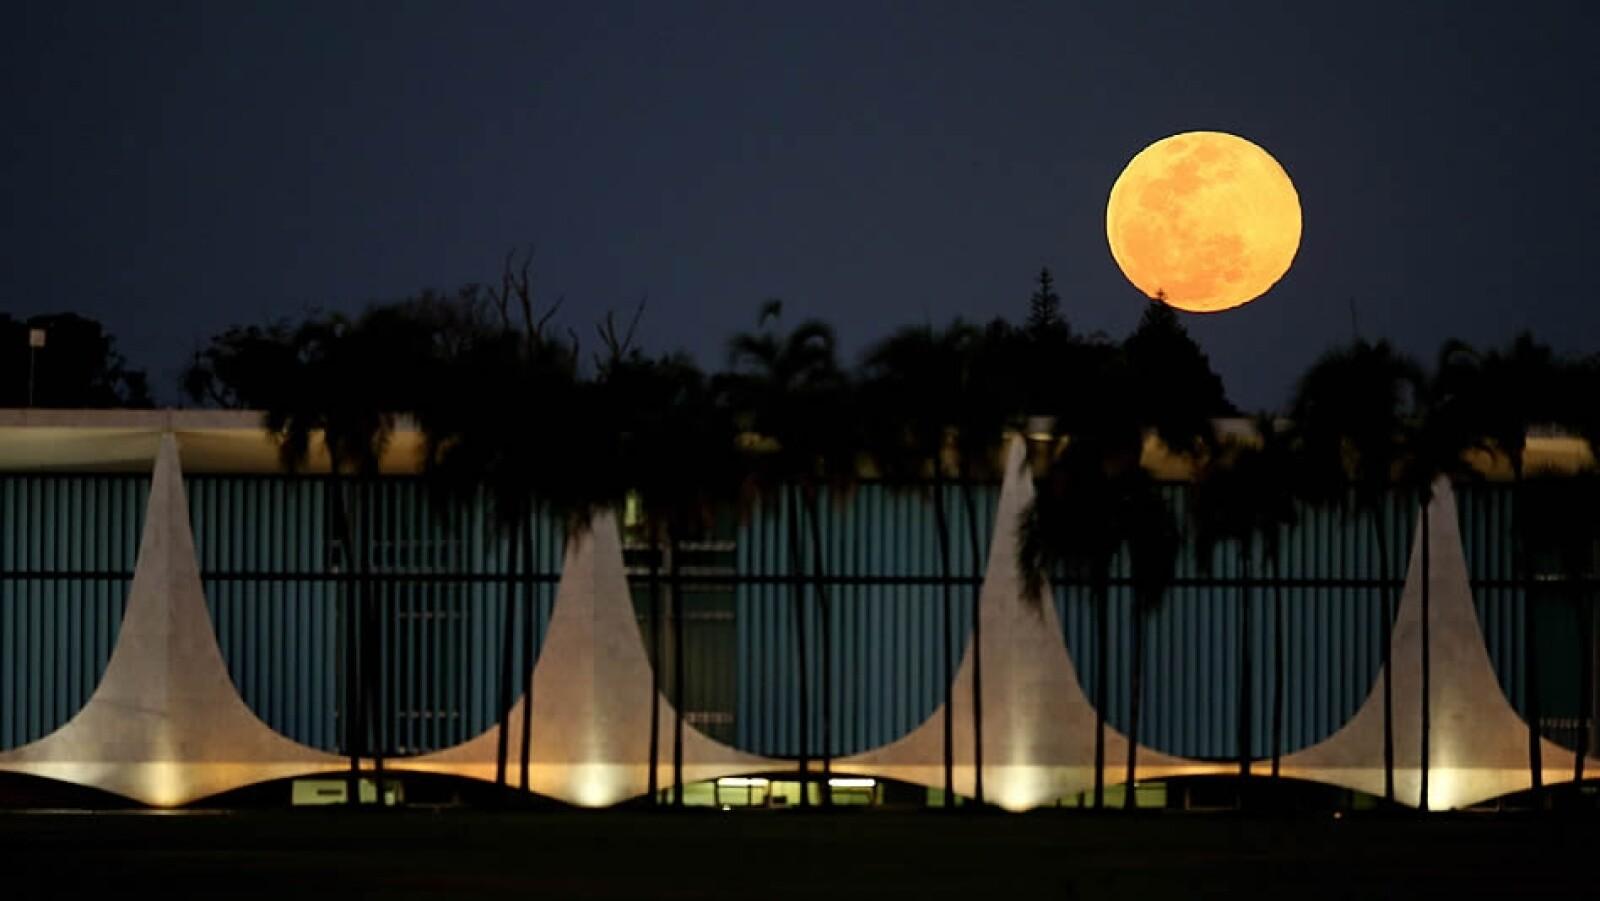 Luna paseo Palacio del Alvorada Brasilia